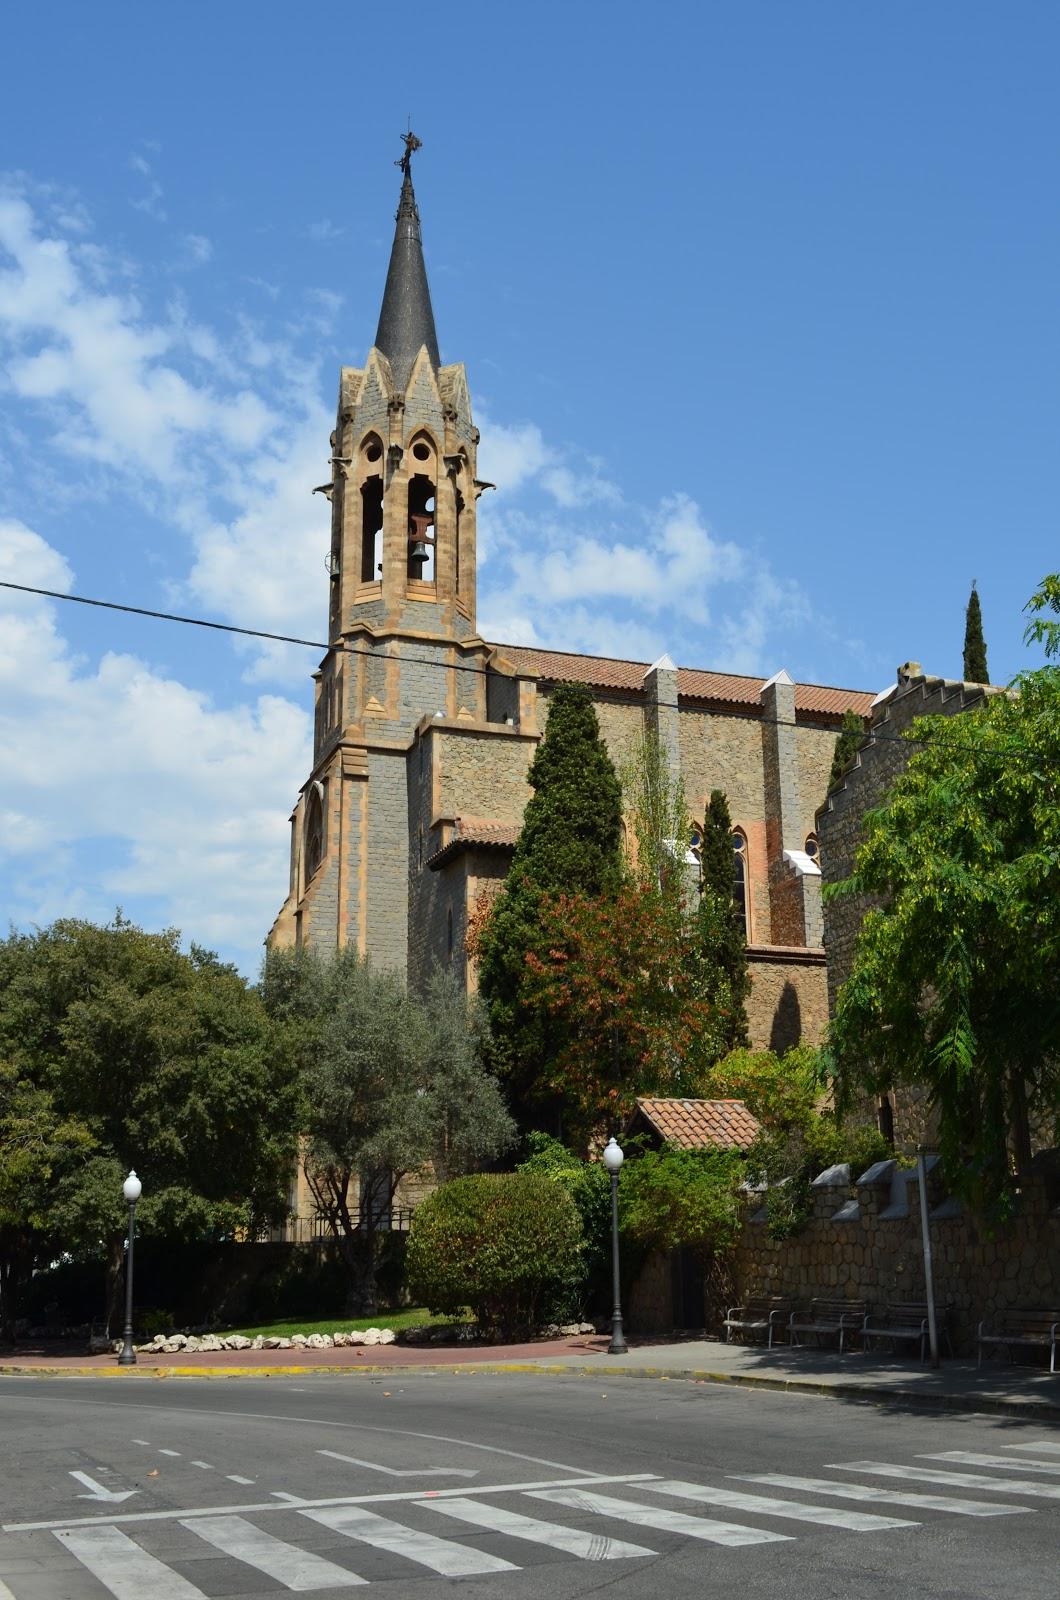 Yovaniotorres santa coloma de gramenet iglesia mayor for Chiquipark en santa coloma de gramenet